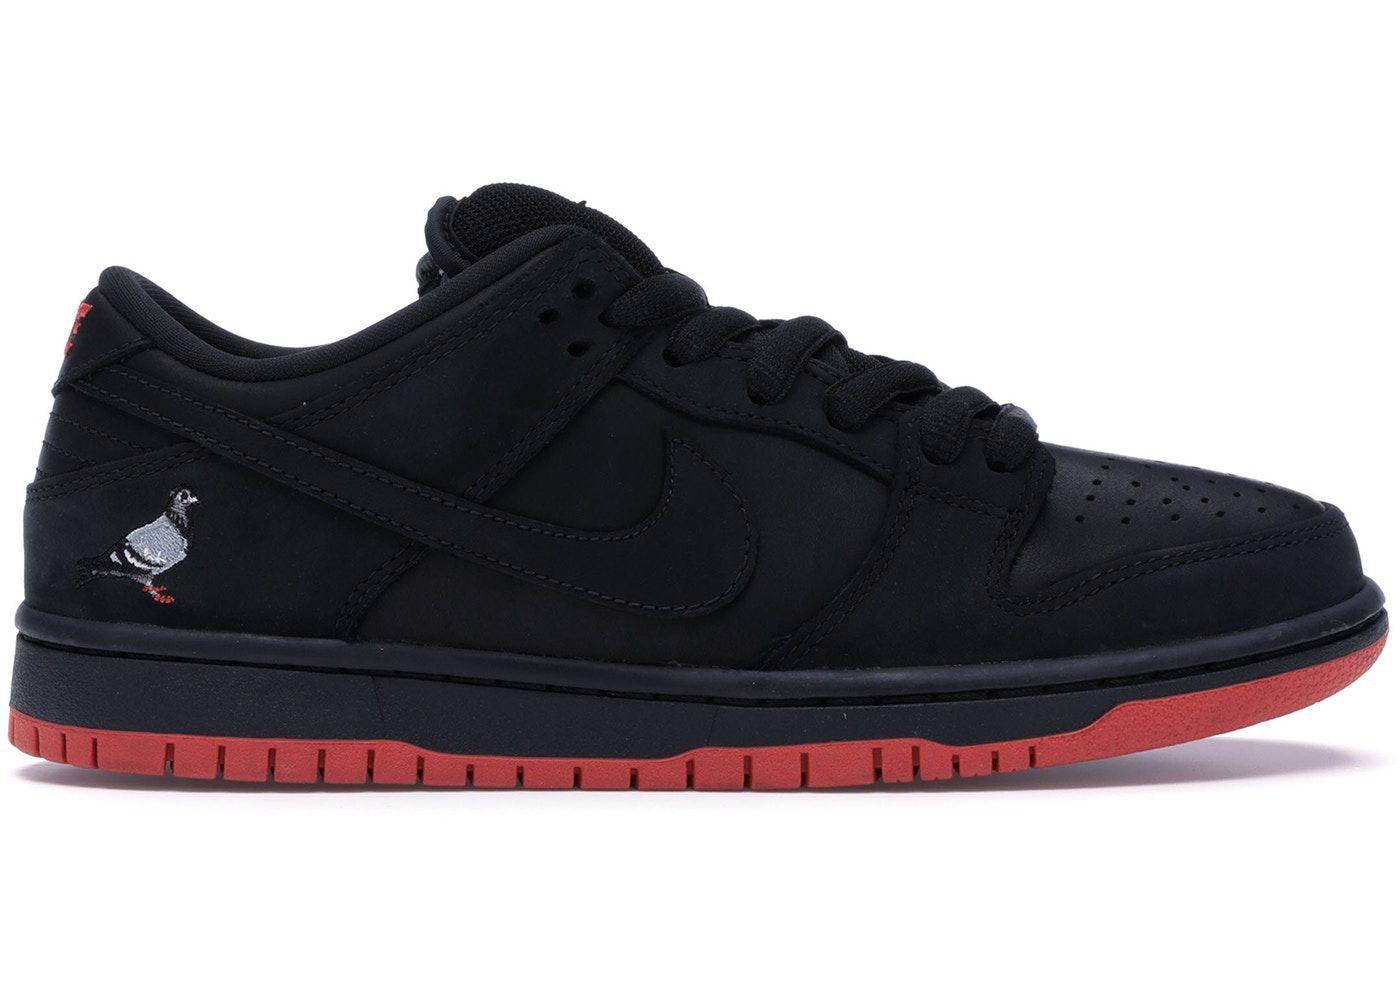 f48f7e40 Nike SB Dunk Low Black Pigeon in 2019 | Shoes | Nike sb dunks, Nike ...